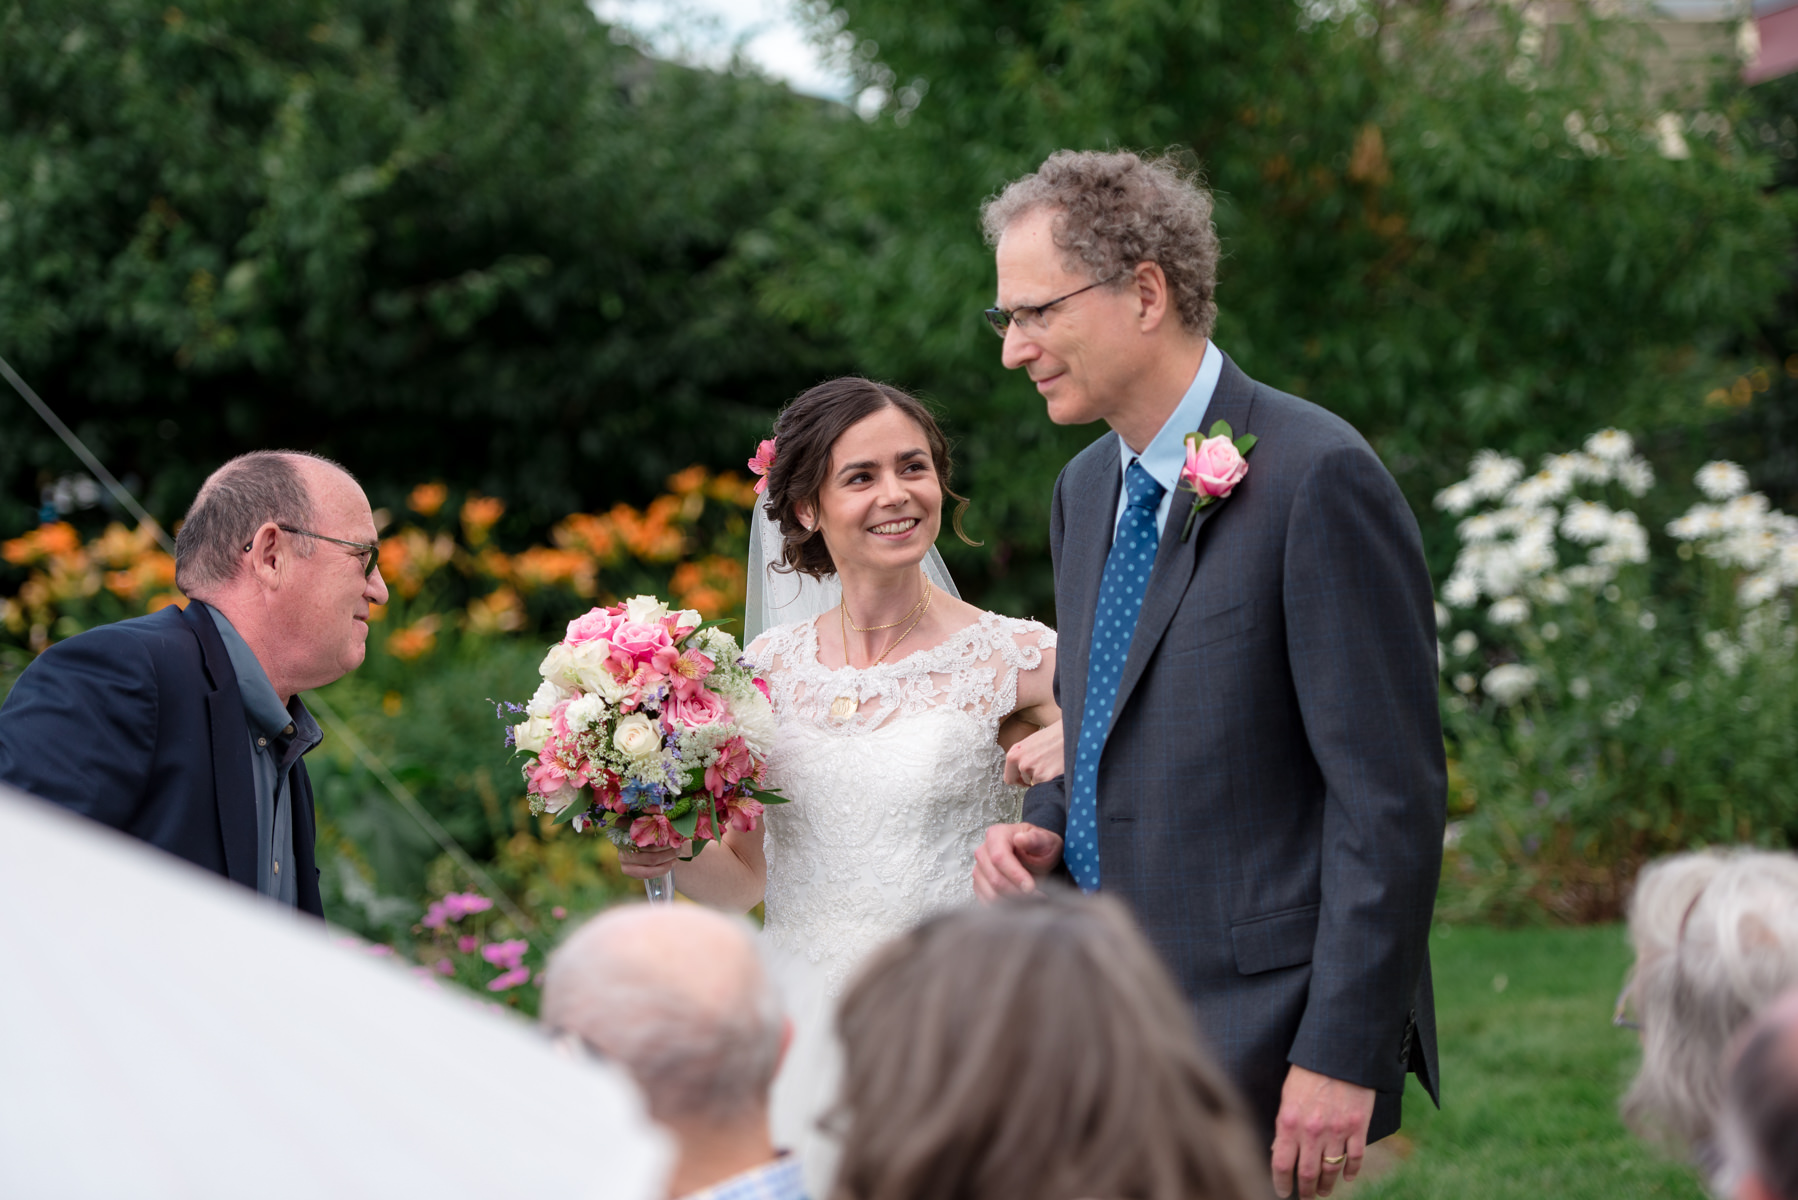 Andrew Tat - Documentary Wedding Photography - Kirkland, Washington - Emily & Cuauh - 08.JPG